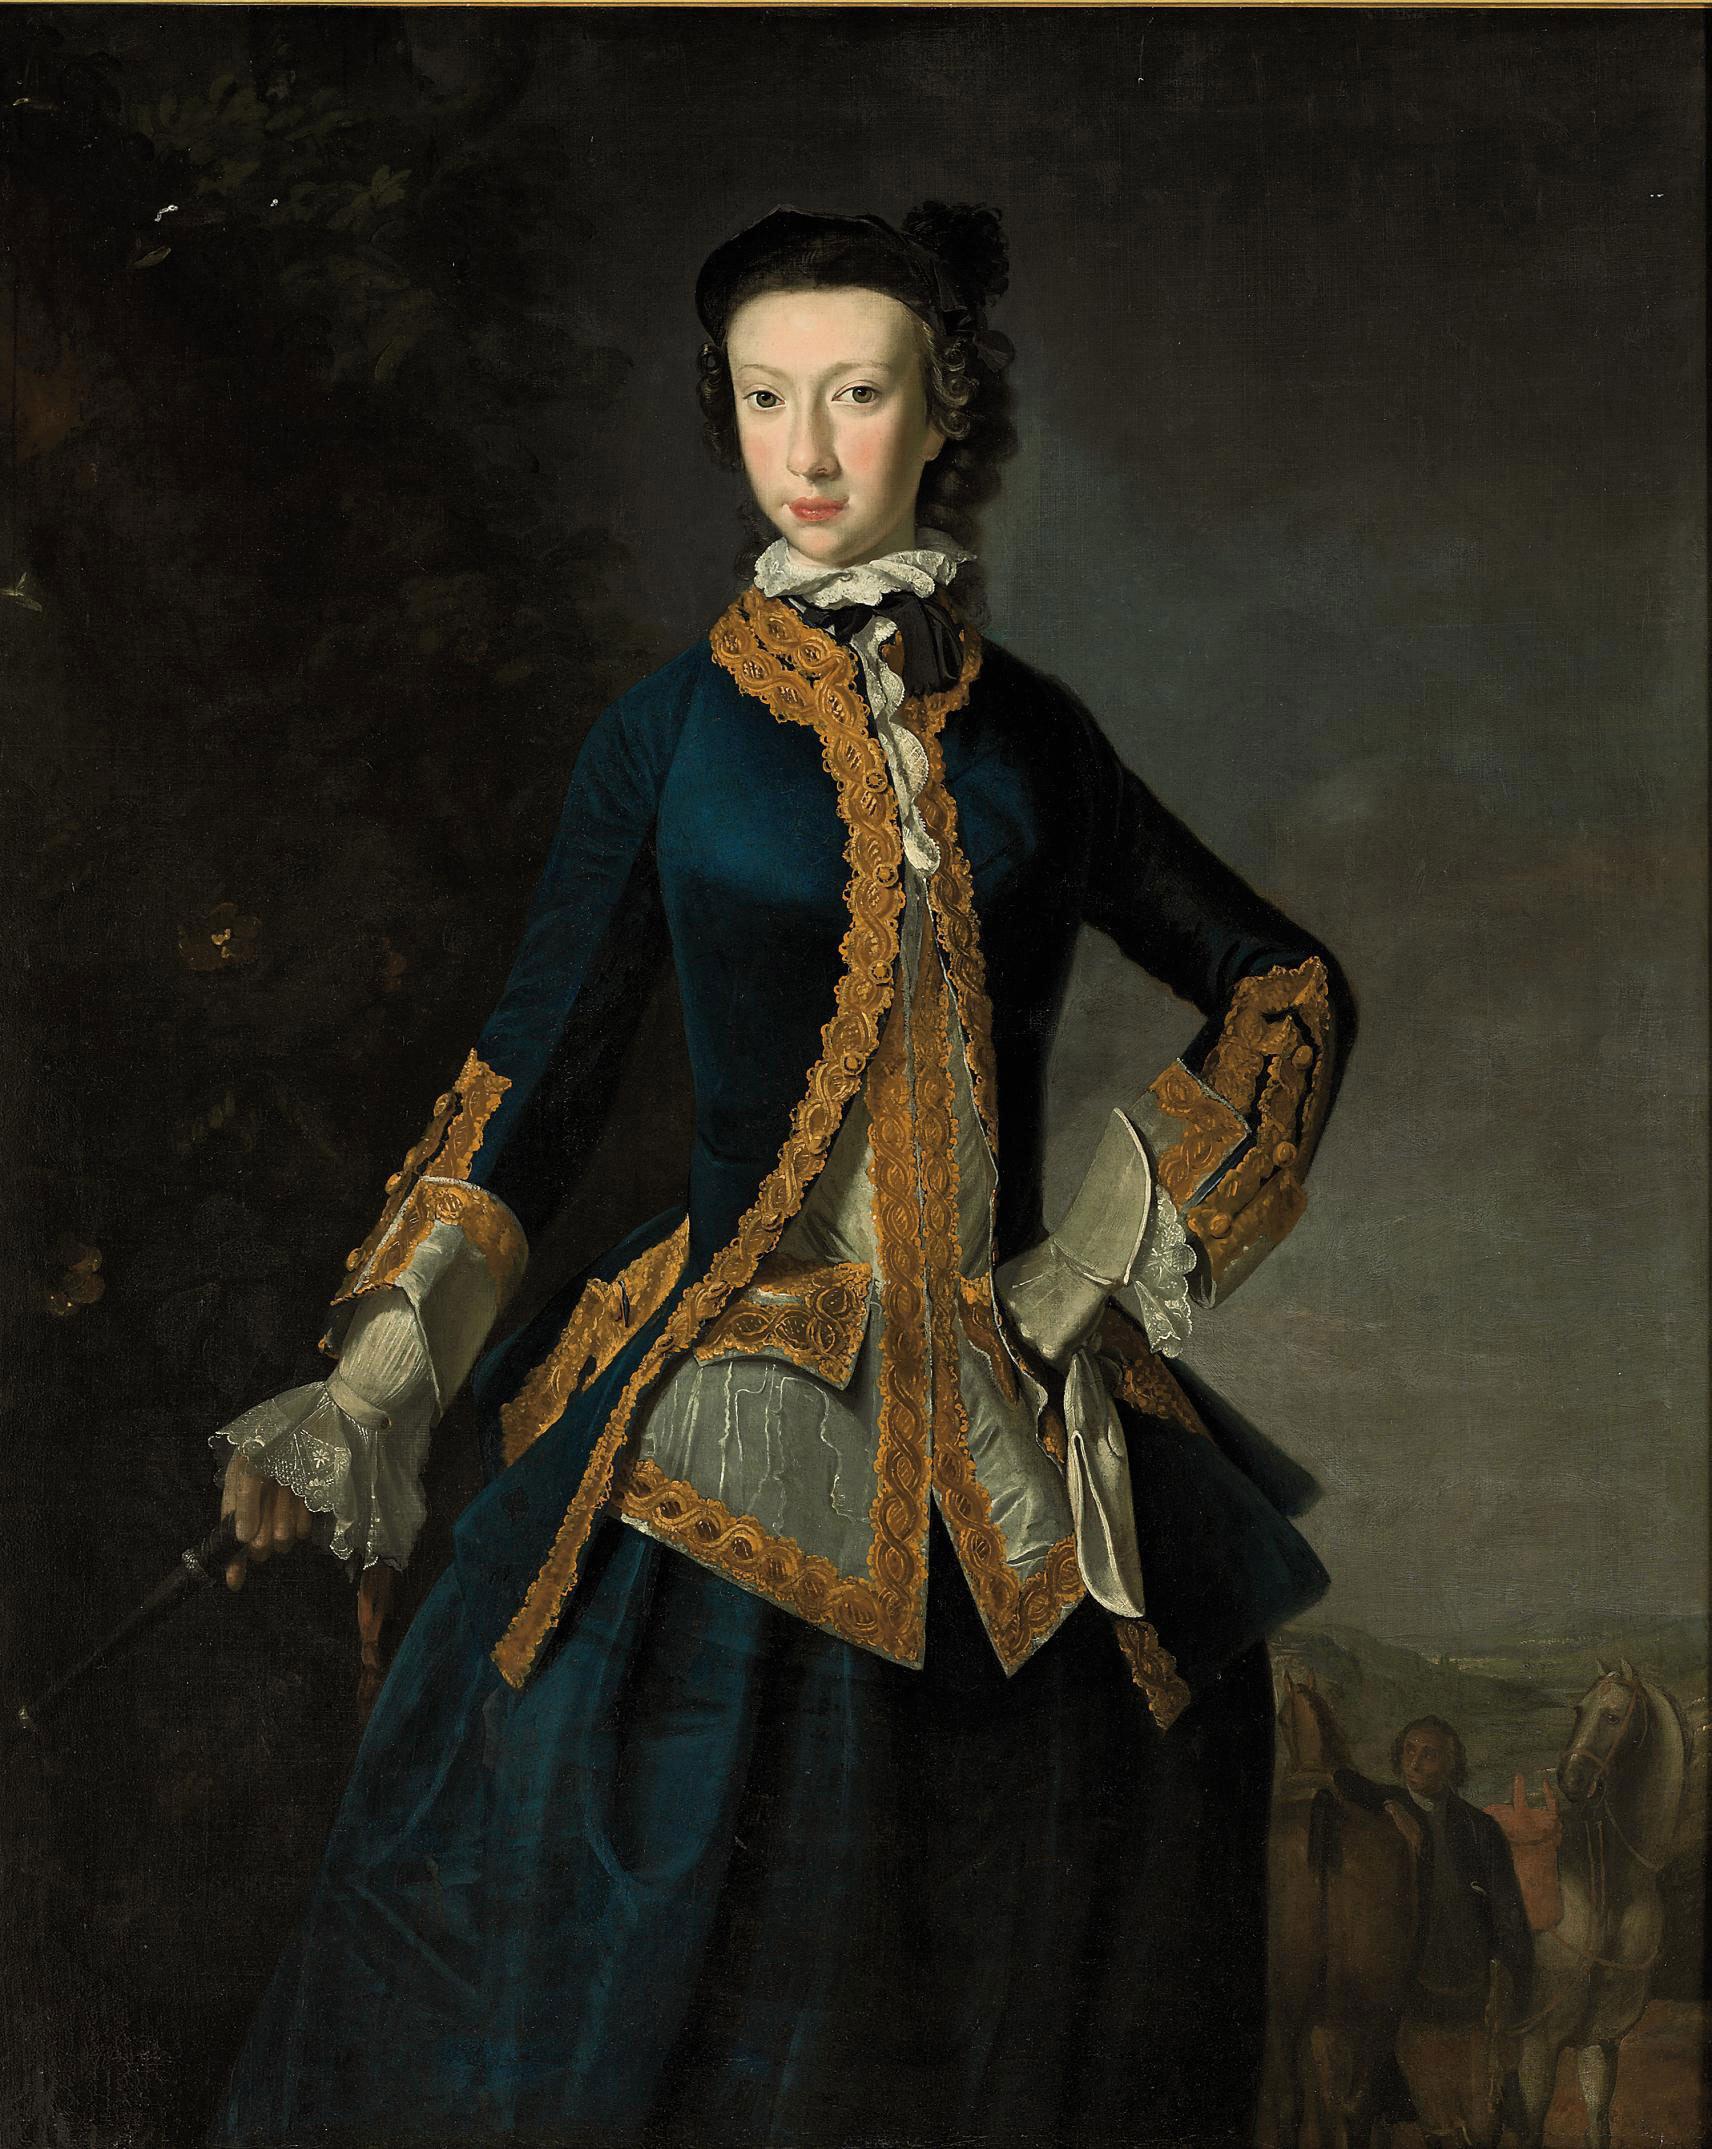 R[obert?] Harvie (?Scottish, active 1751-1763)